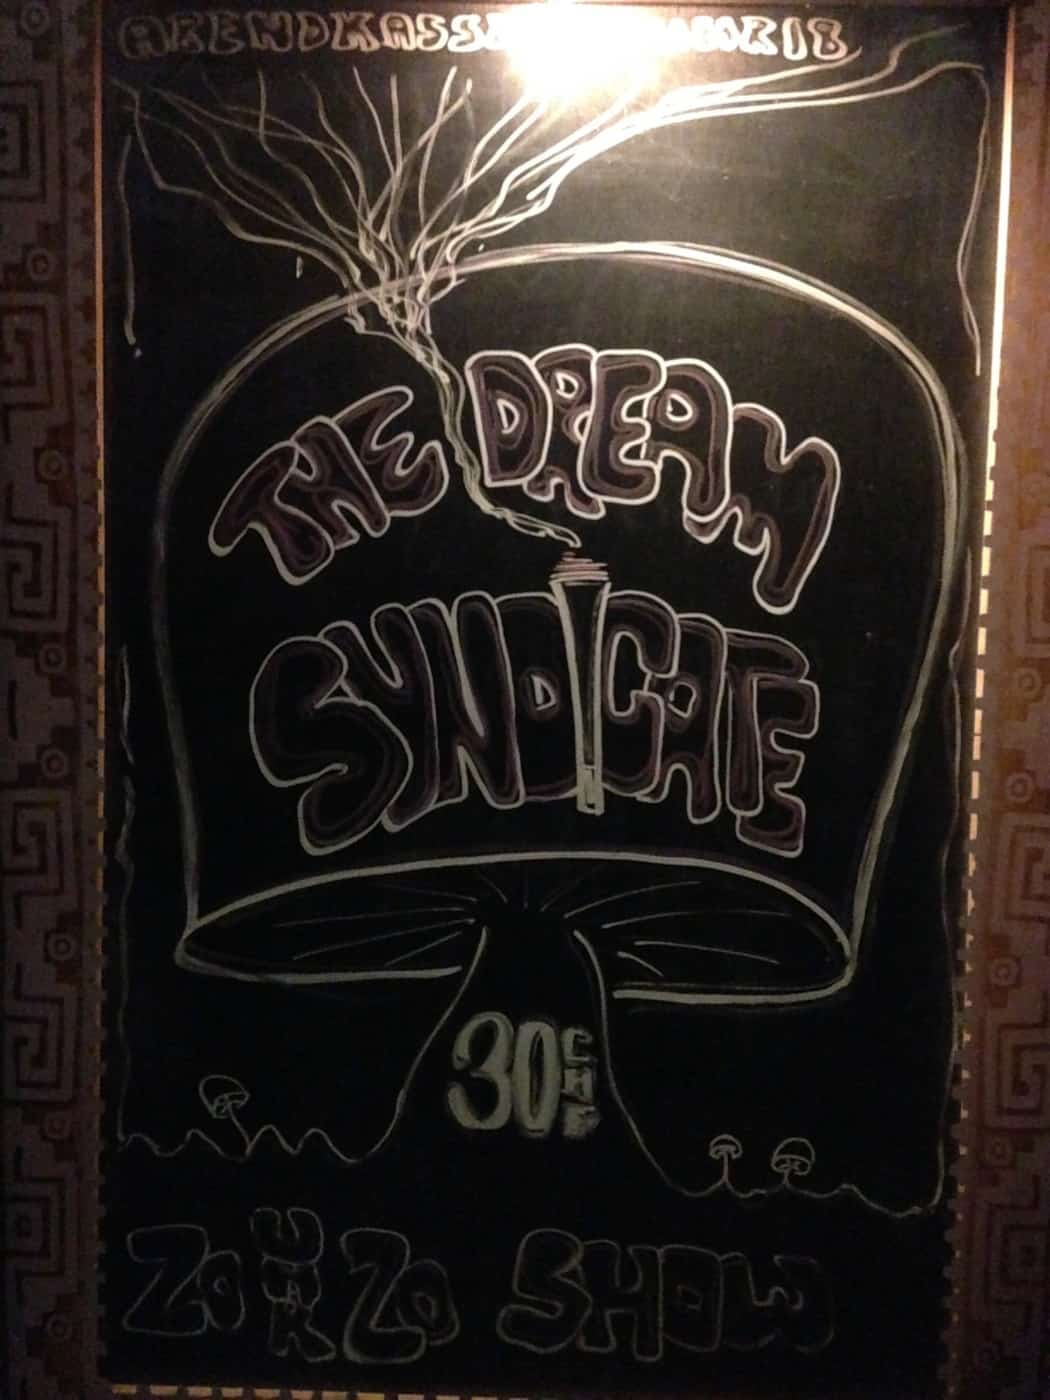 7 Chalk gig poster art at venue